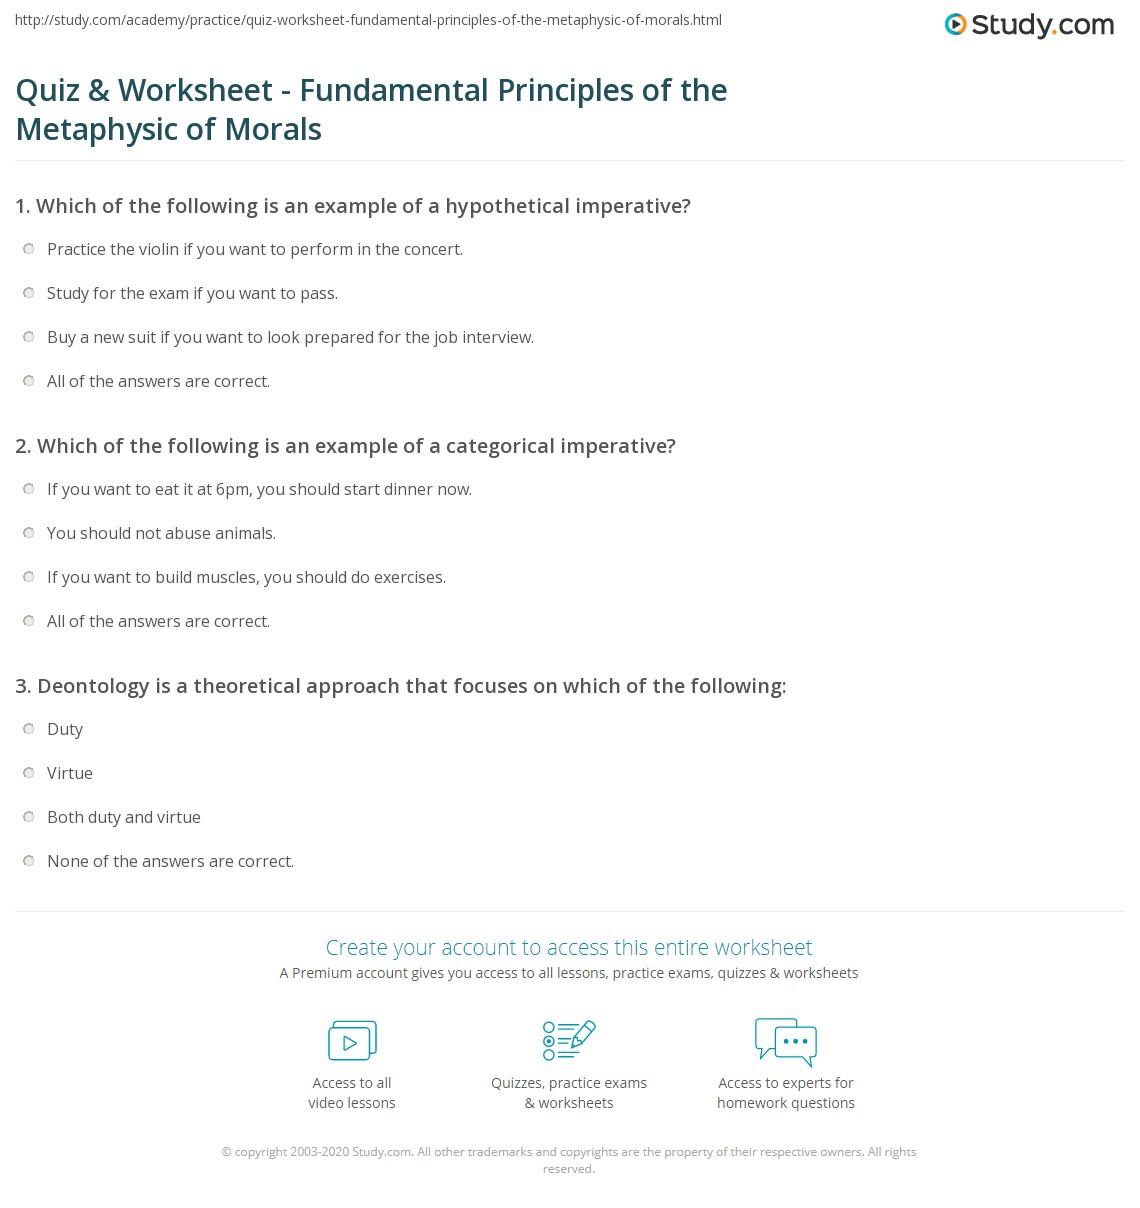 Quiz Worksheet Fundamental Principles Of The Metaphysic Of